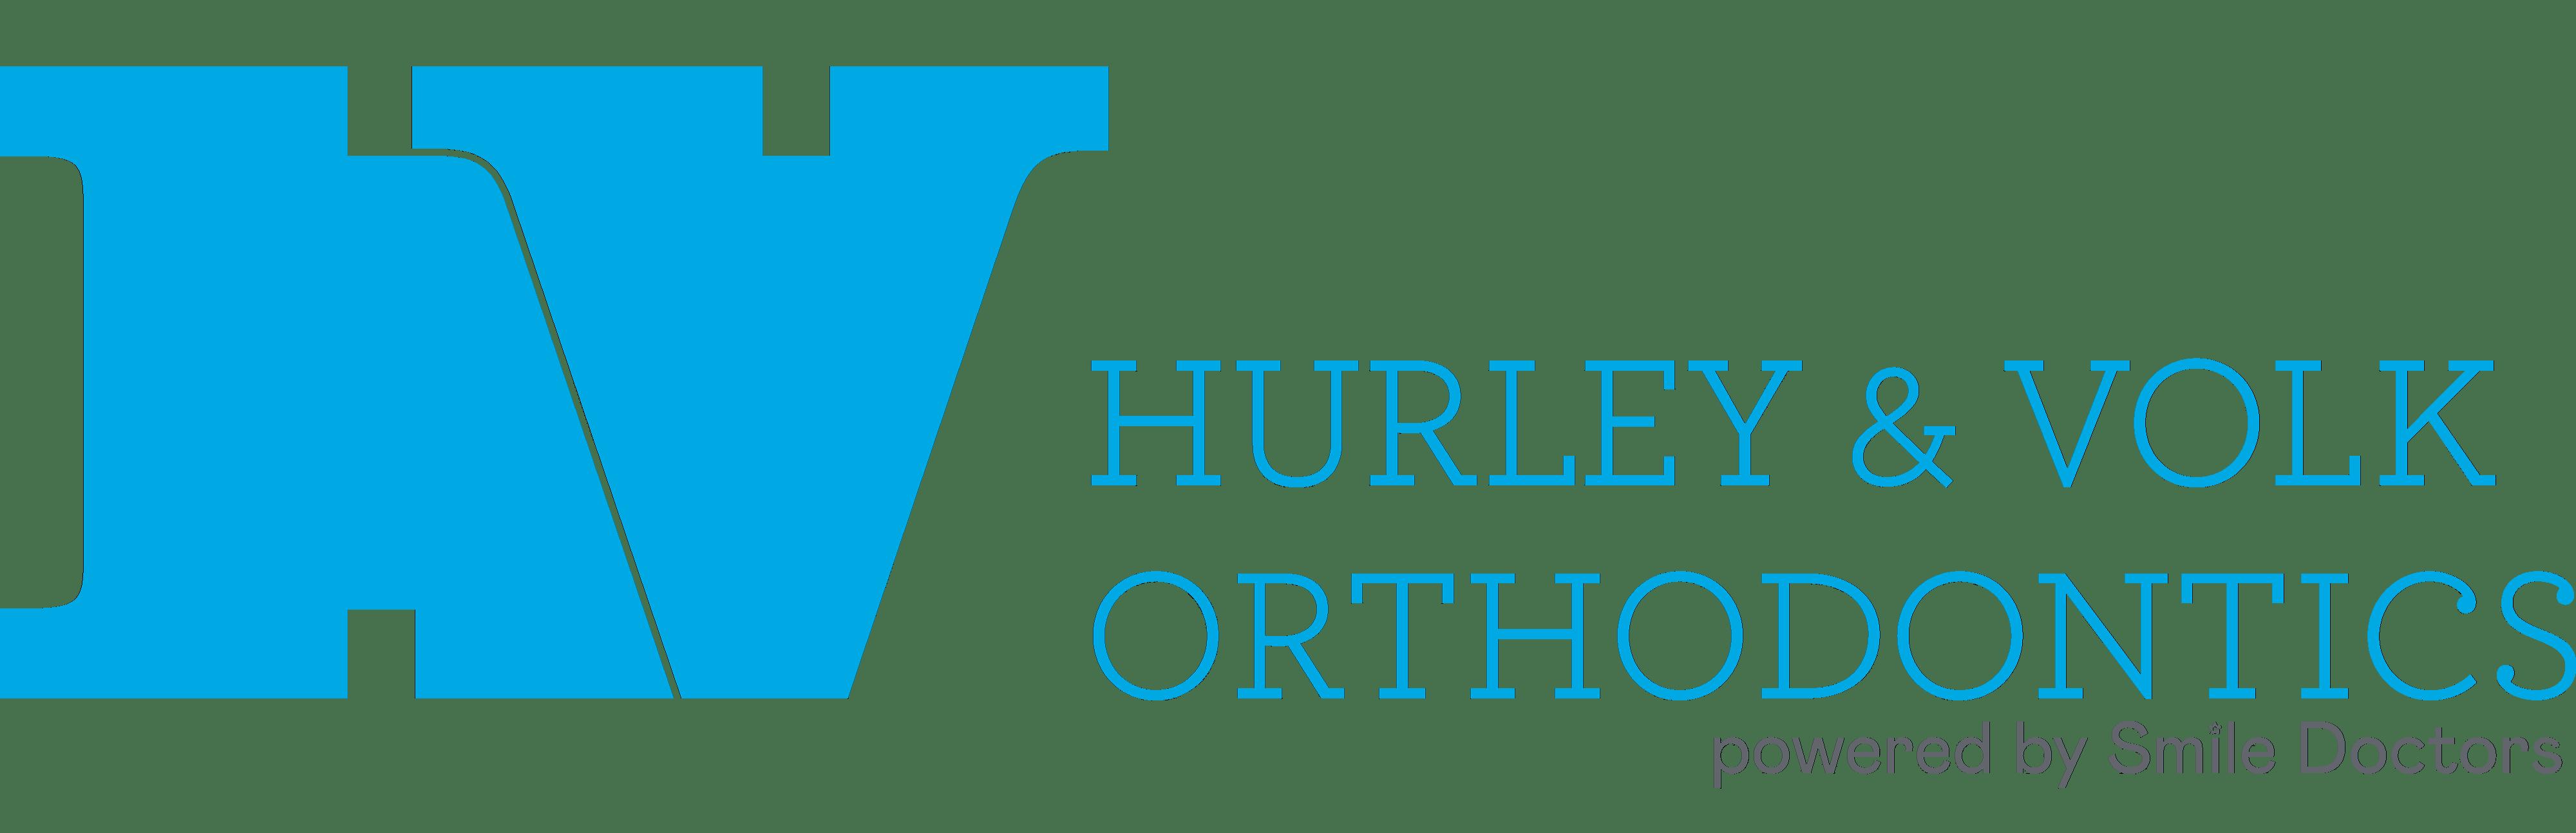 Hurley & Volk Orthodontics Powered by Smile Doctors